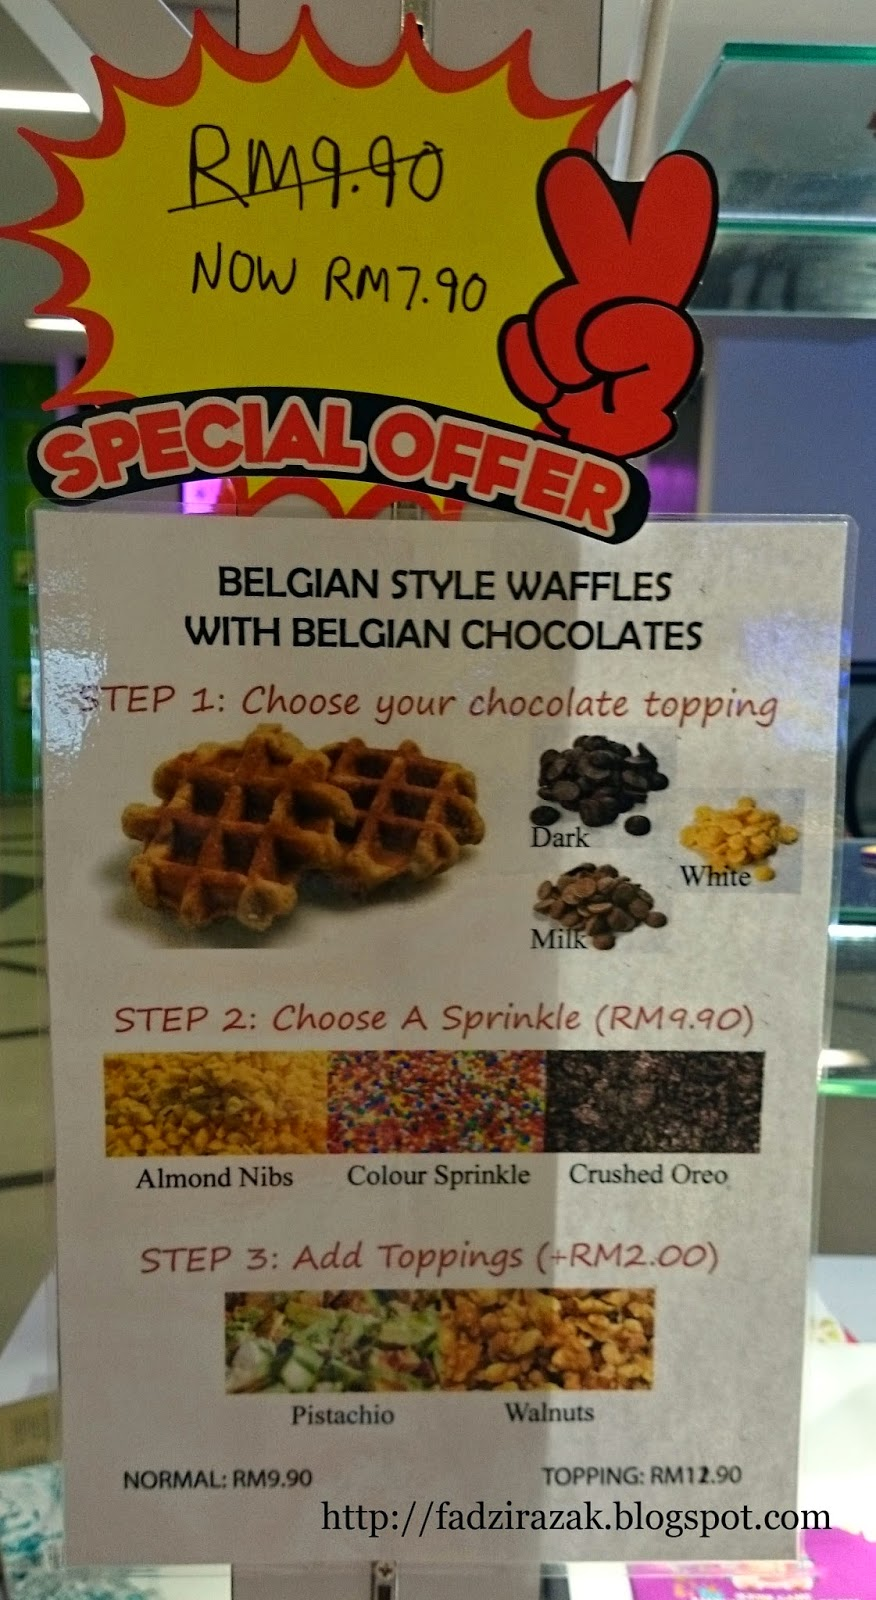 Belgian Style Waffle with Belgium Chocolate